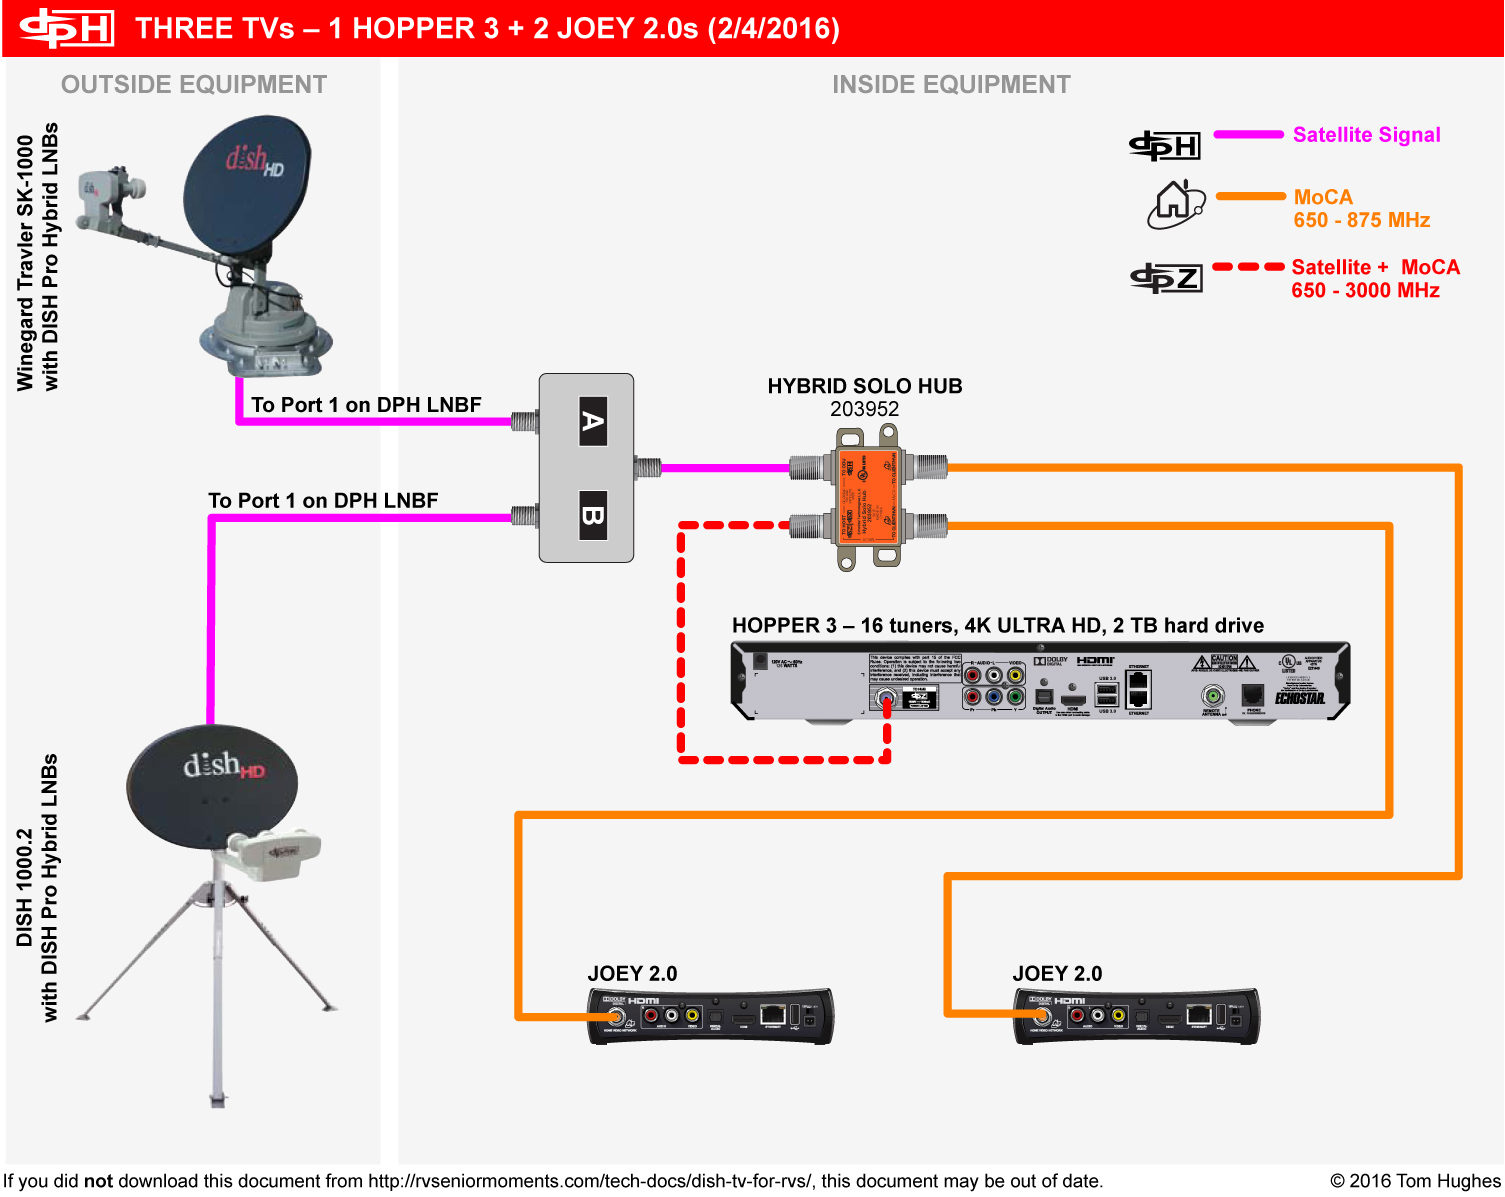 3 tv wiring diagram ka 6031  dish network joey wiring diagram  ka 6031  dish network joey wiring diagram